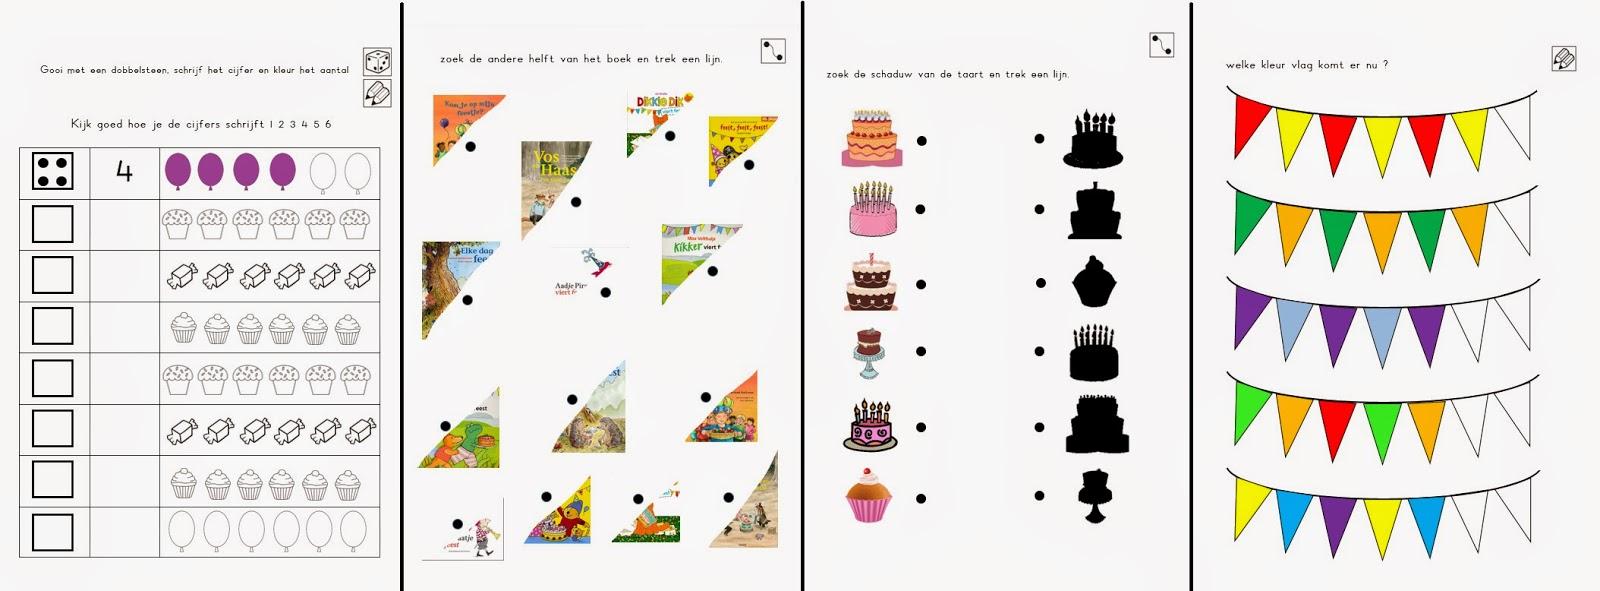 Miranda S Lesmaterialen Feest Kinderboekenweek 2014